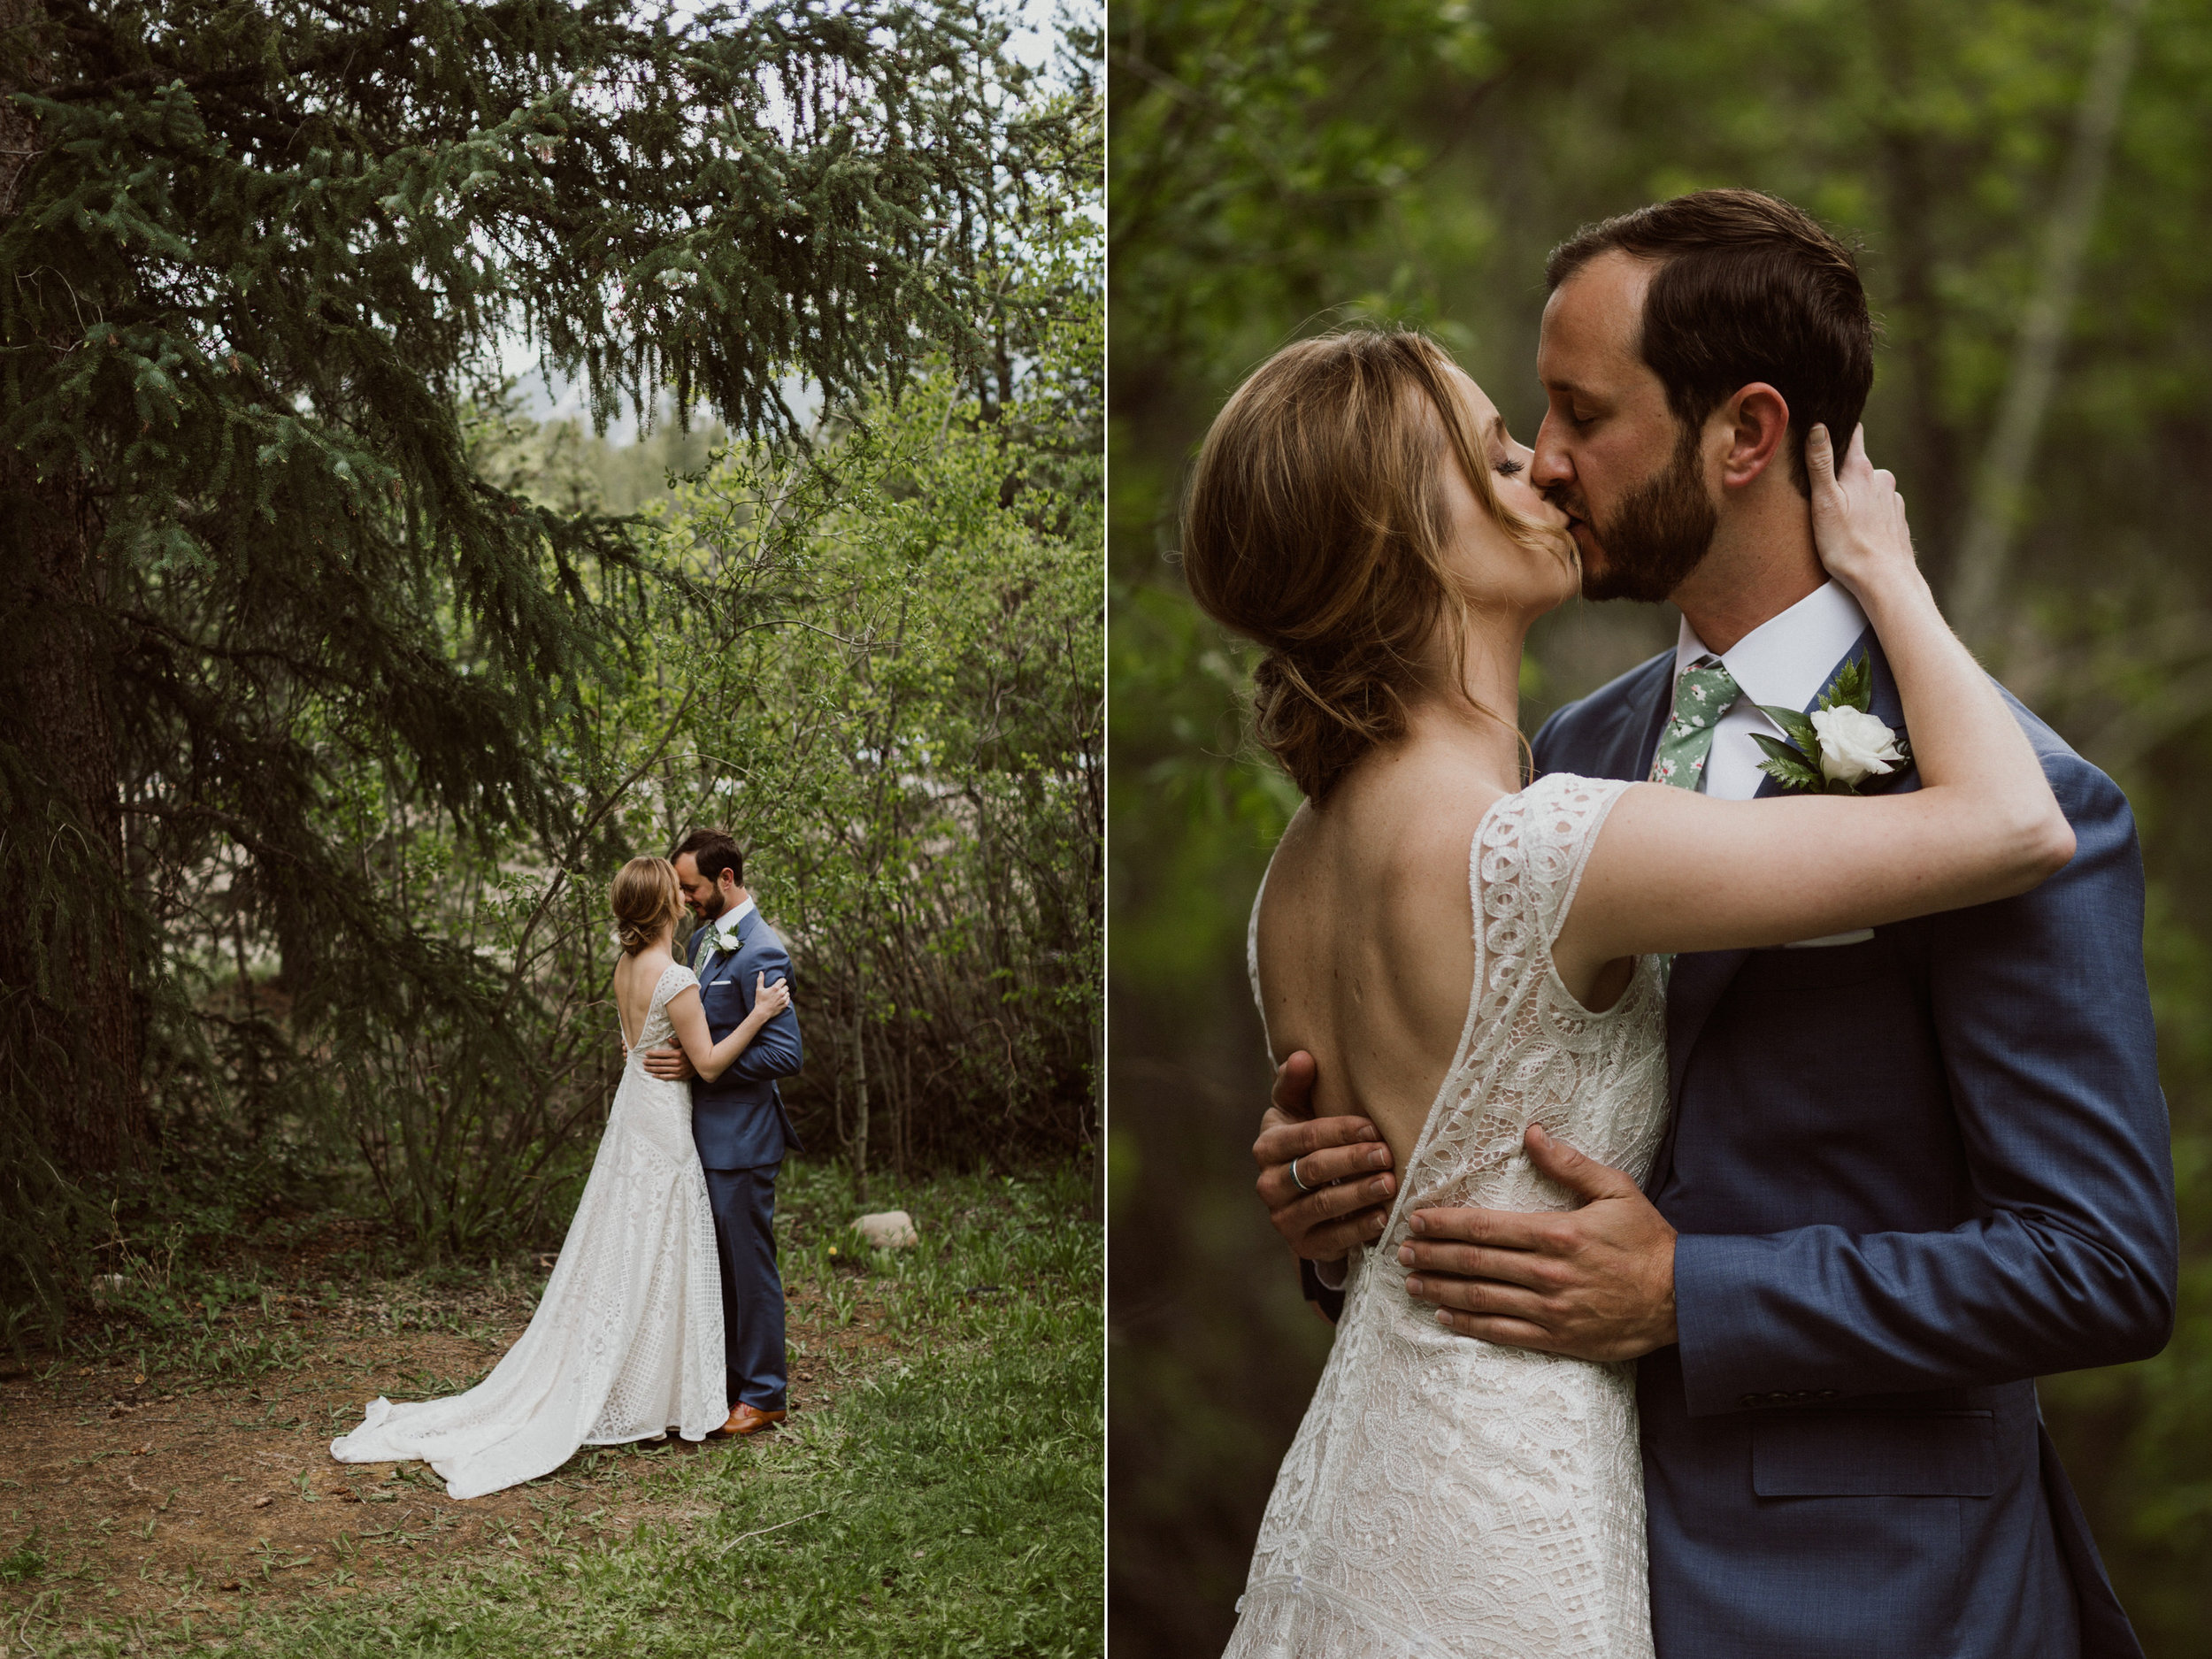 bohemian-backyard-wedding-breckenridge-colorado-163.jpg